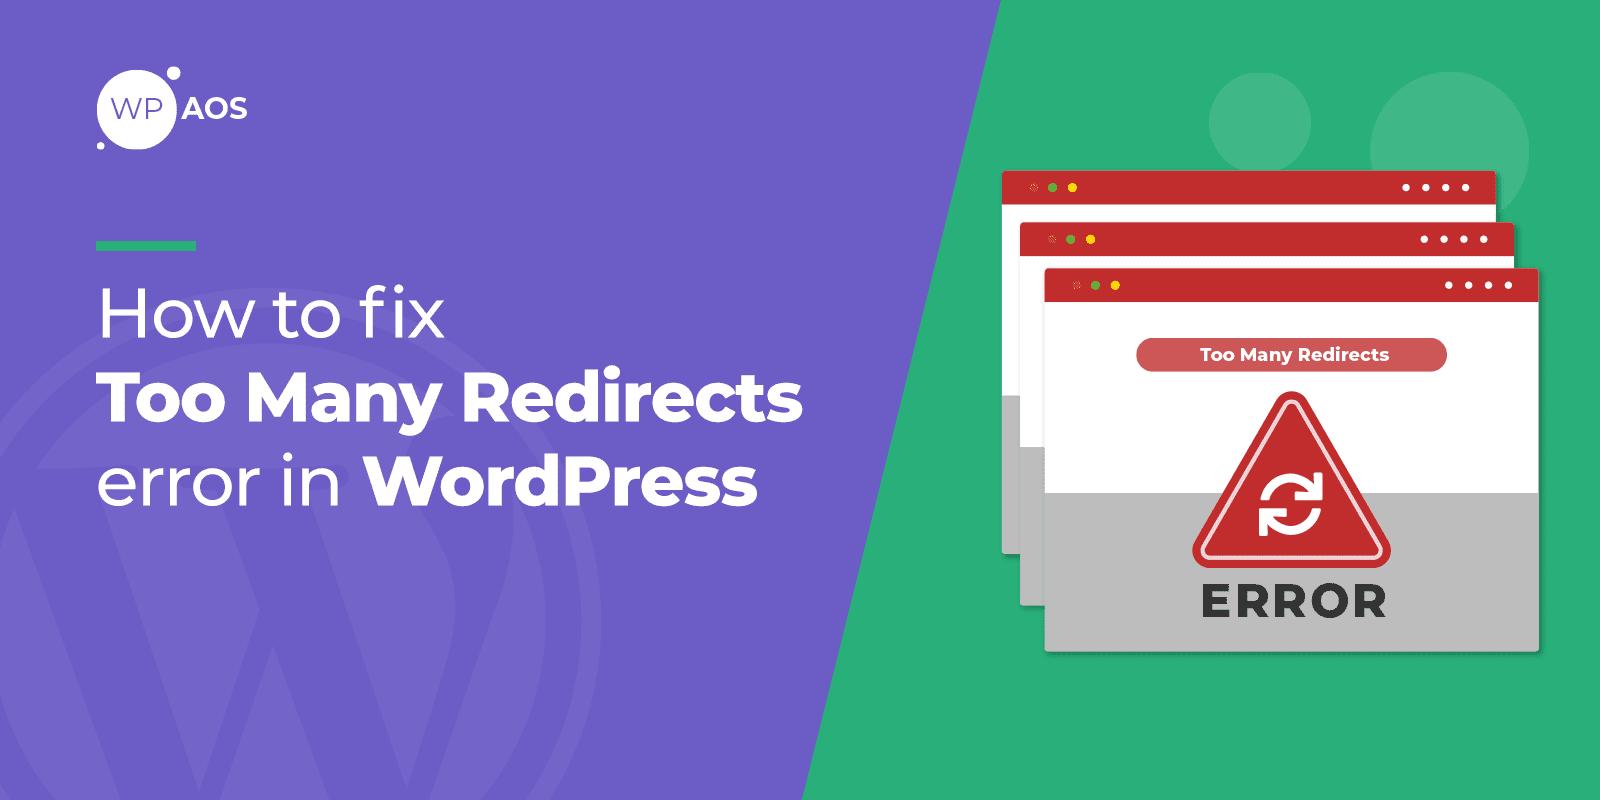 too many redirects error in WordPress, website maintenance, wpaos